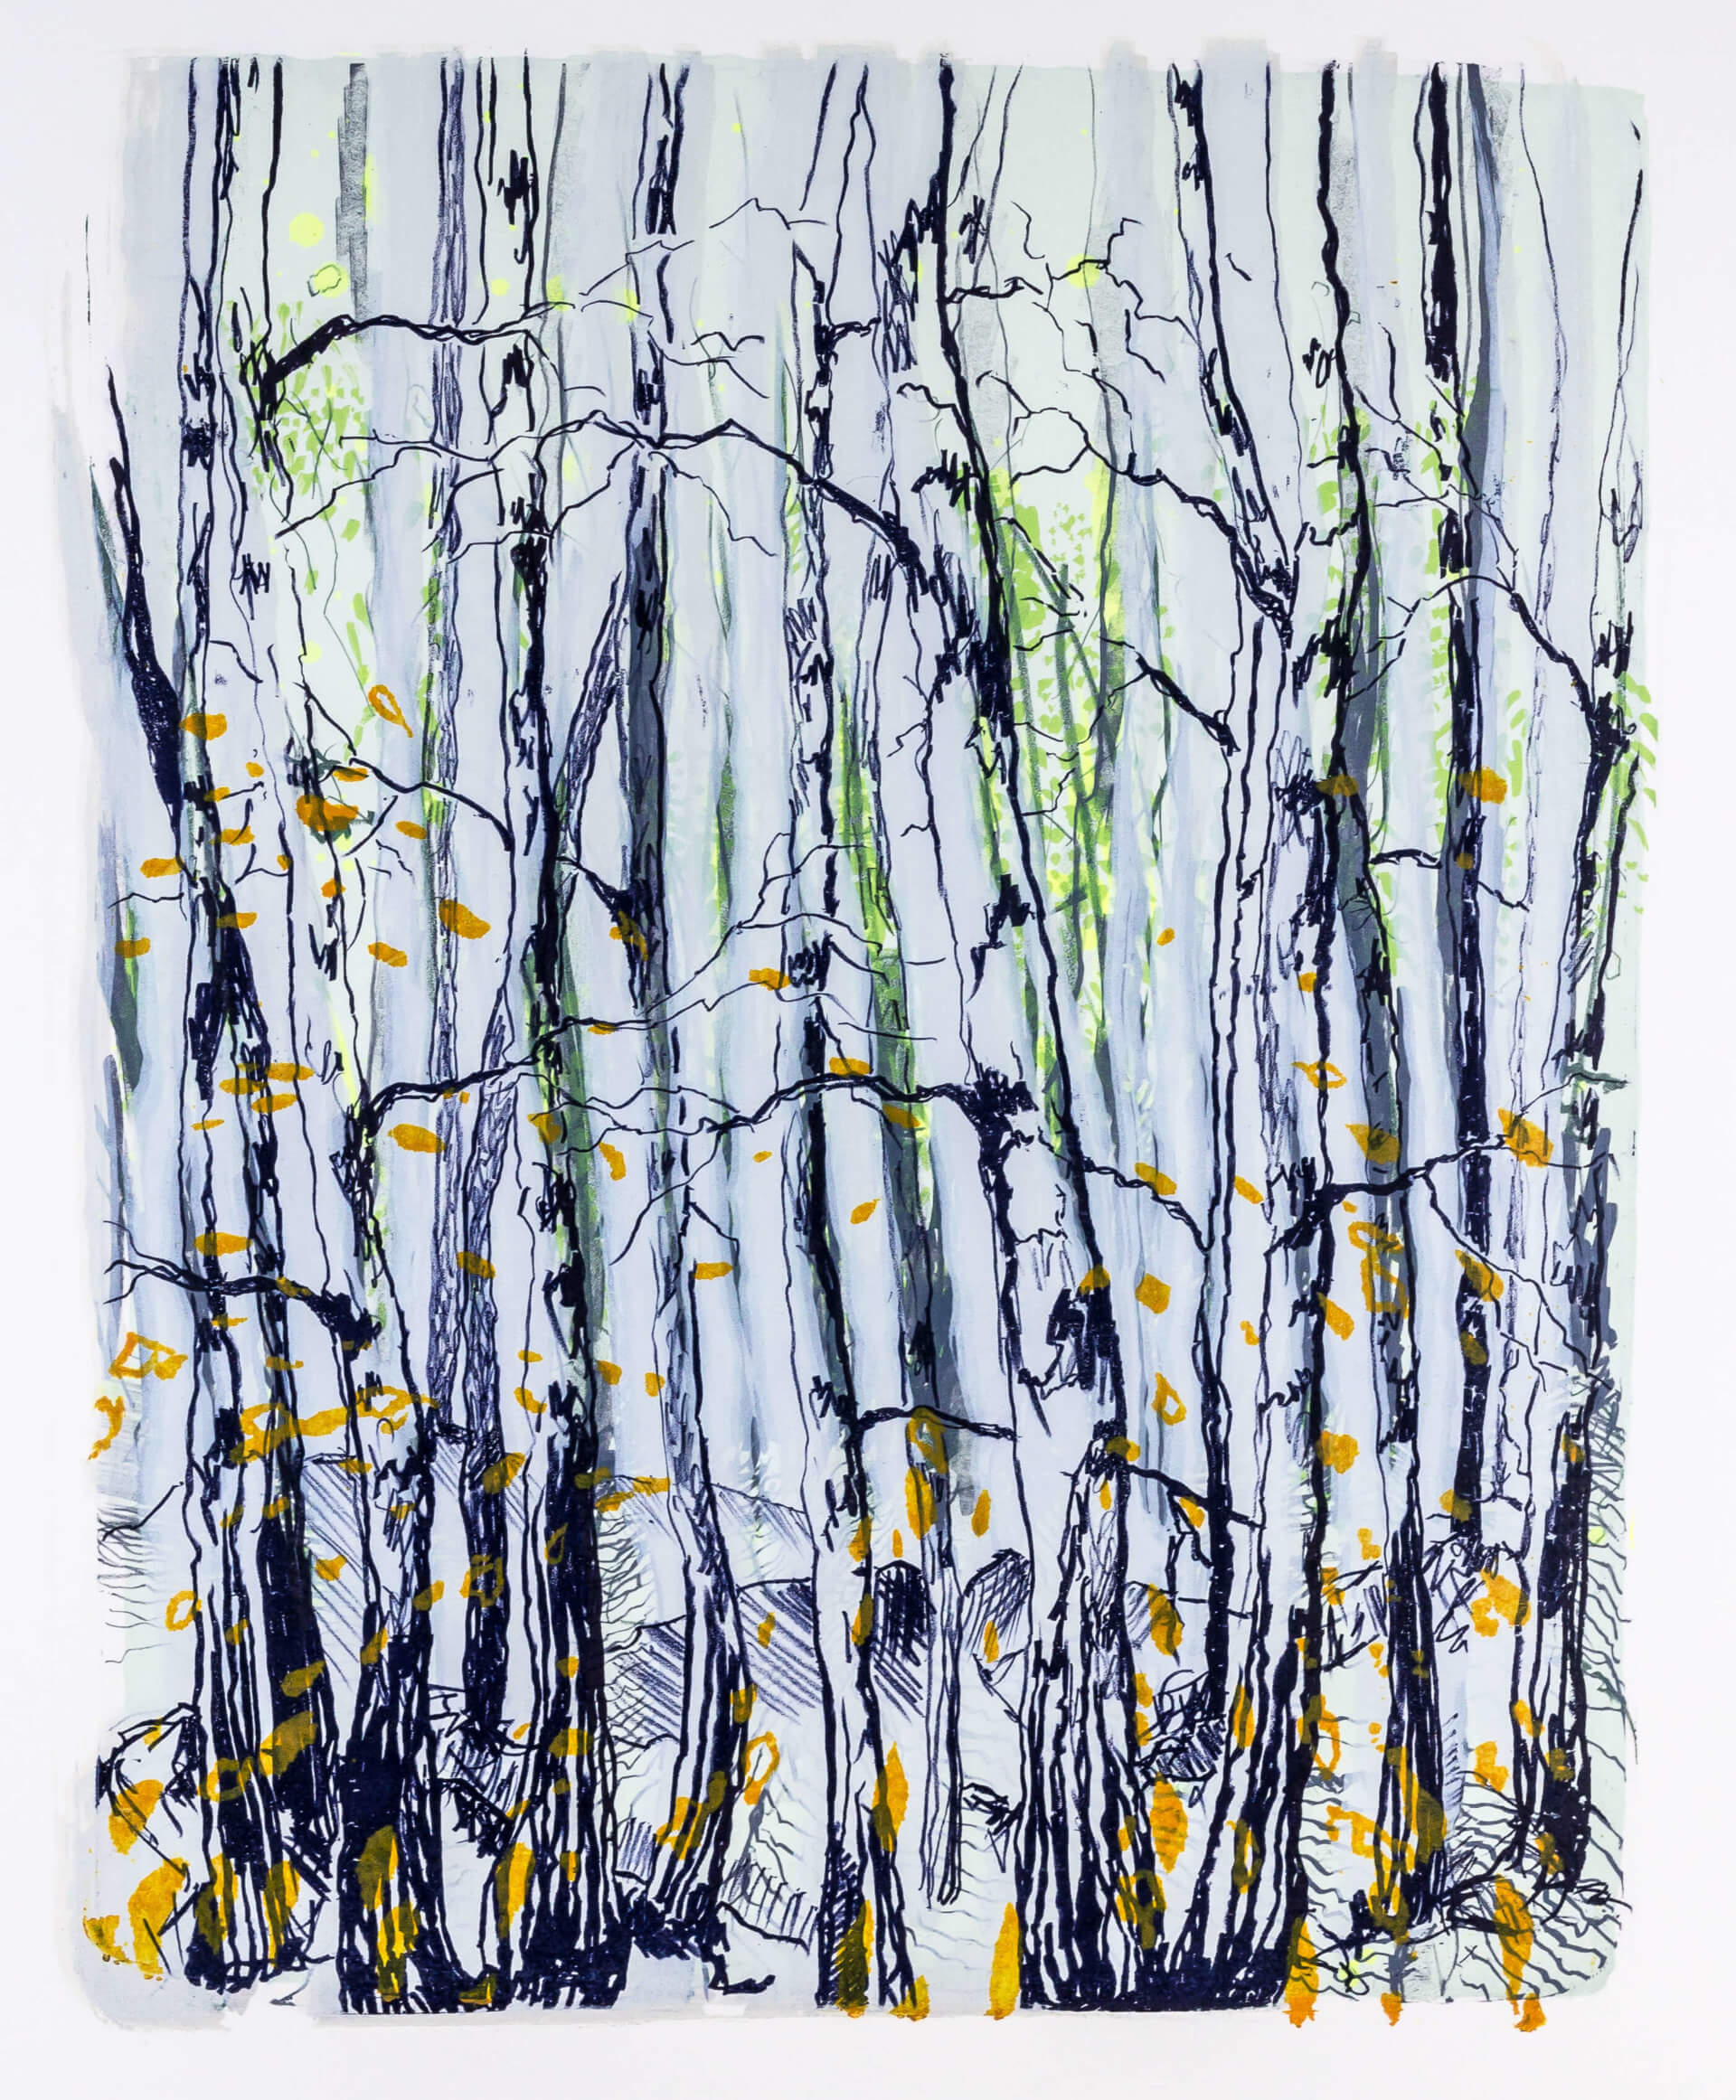 Katharina Albers, Wald X-XXIII, 2015, Farblithographie, Unikat, 50×40 cm